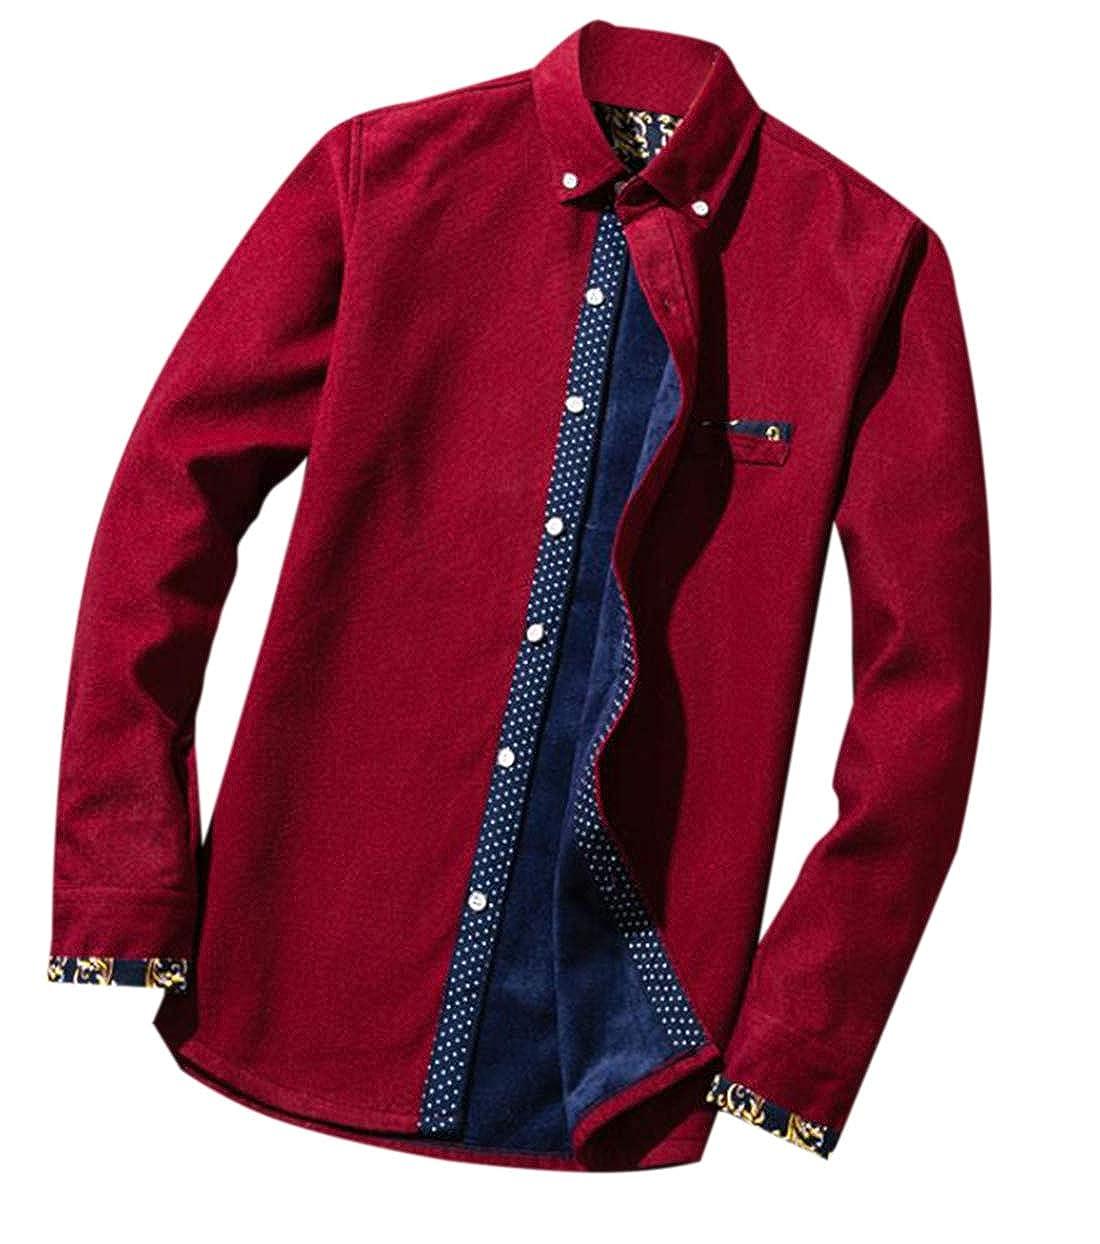 Twcx Men Lapel Thicken Warm Casual Button Up Fleece Lined Solid Color Corduroy Shirt